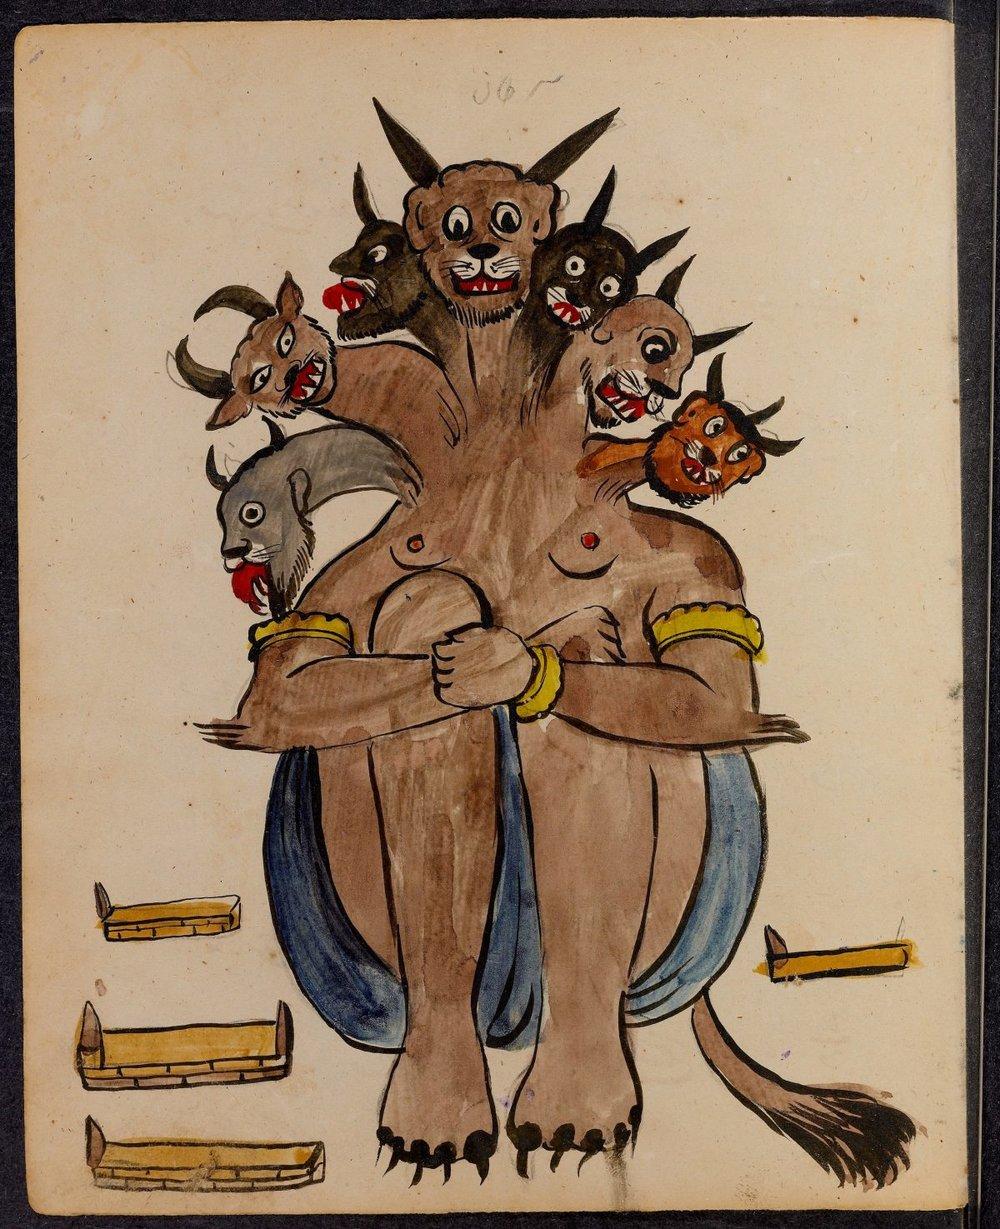 Demons-iran-18-1200x1475.jpg